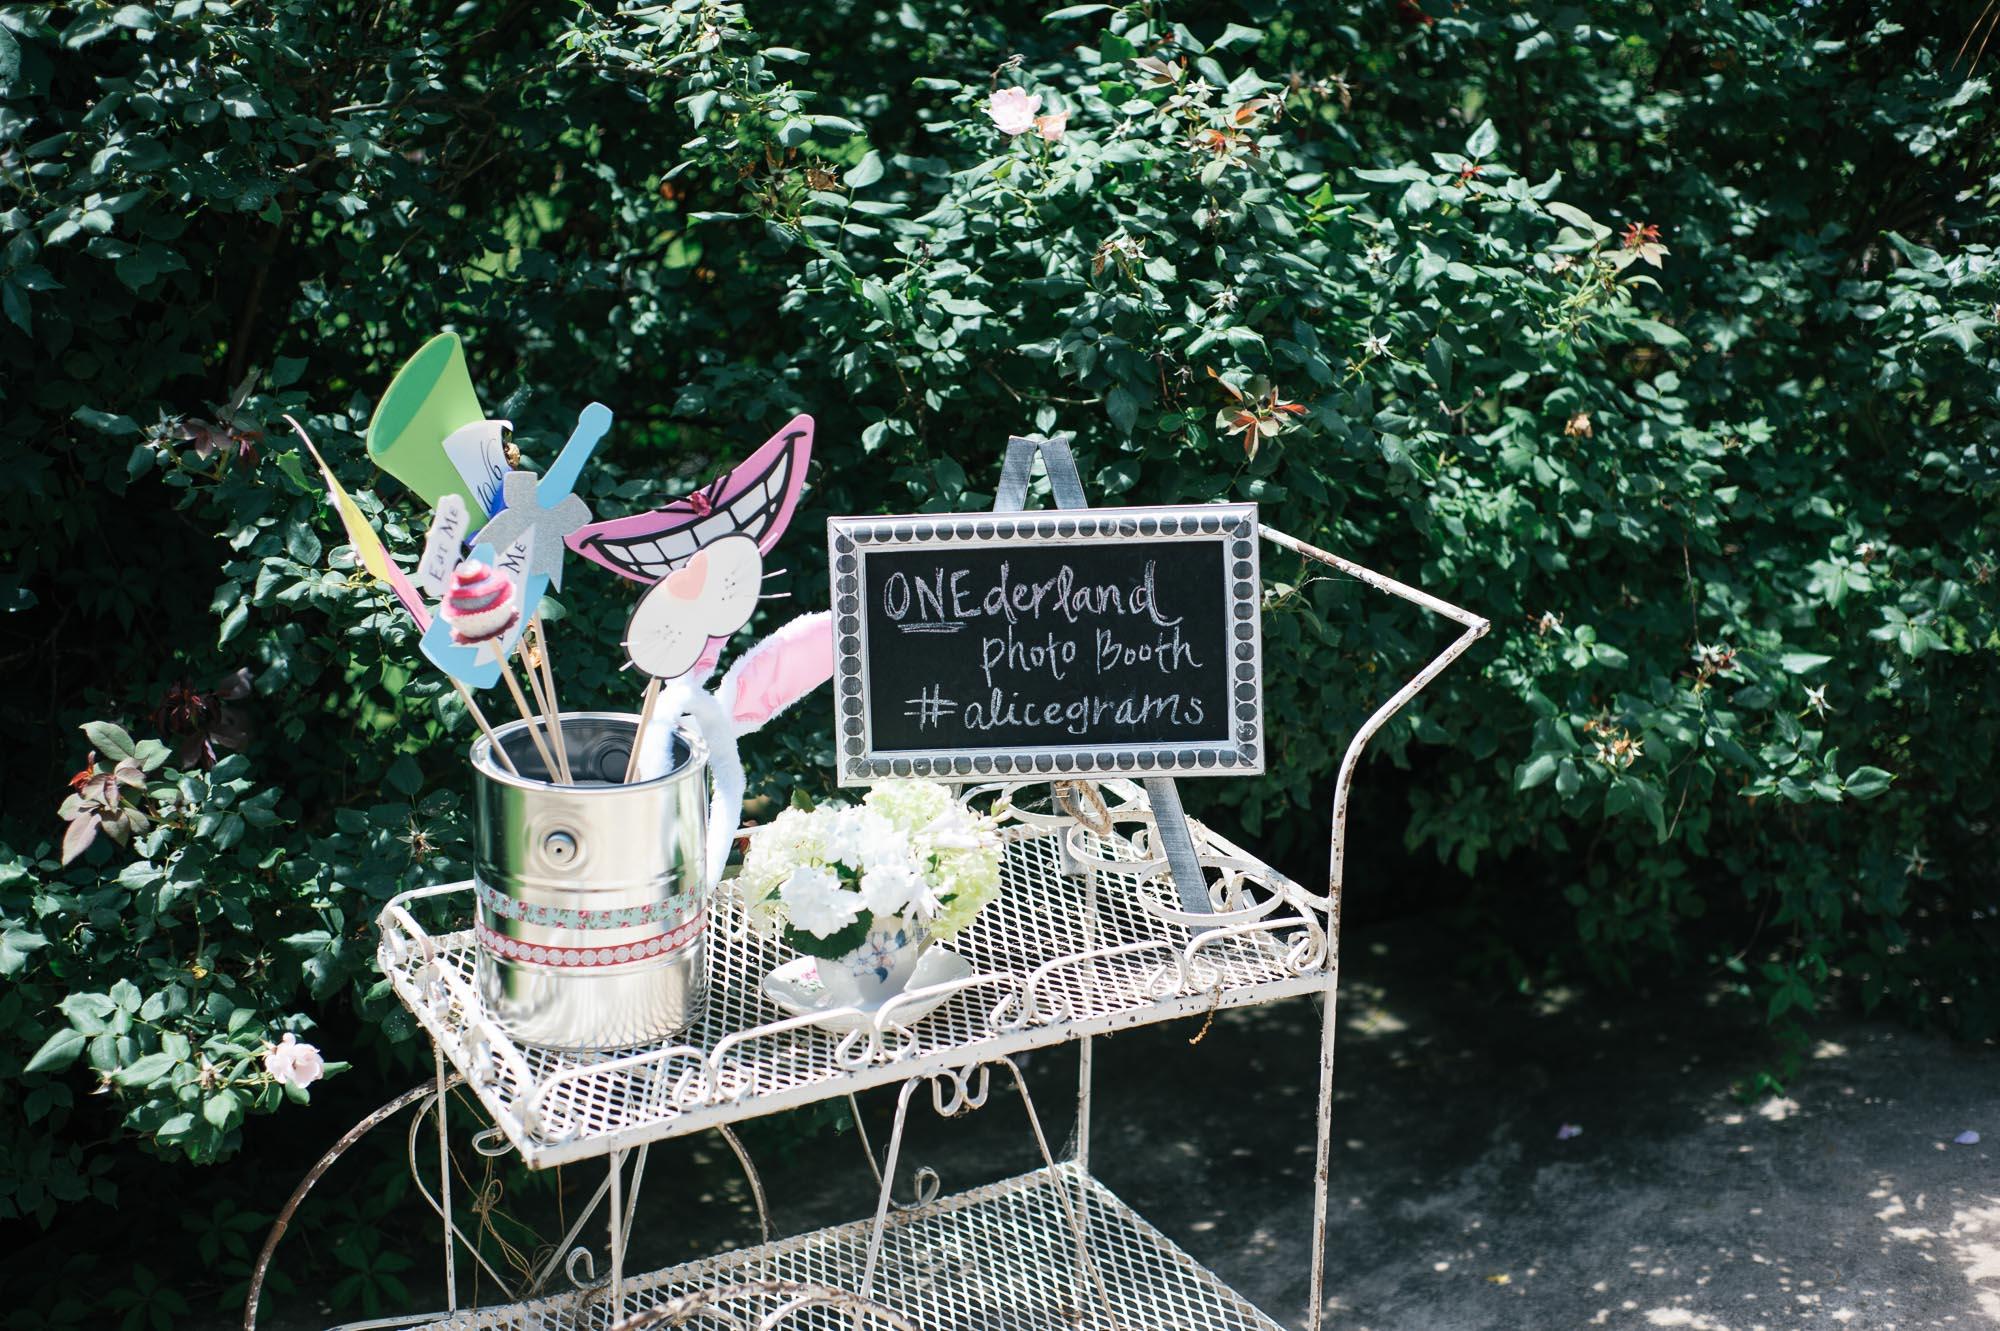 m.newsom-photography-one-year-old-girls-birthday-party-ideas-alice-in-wonderland (12 of 42).jpg